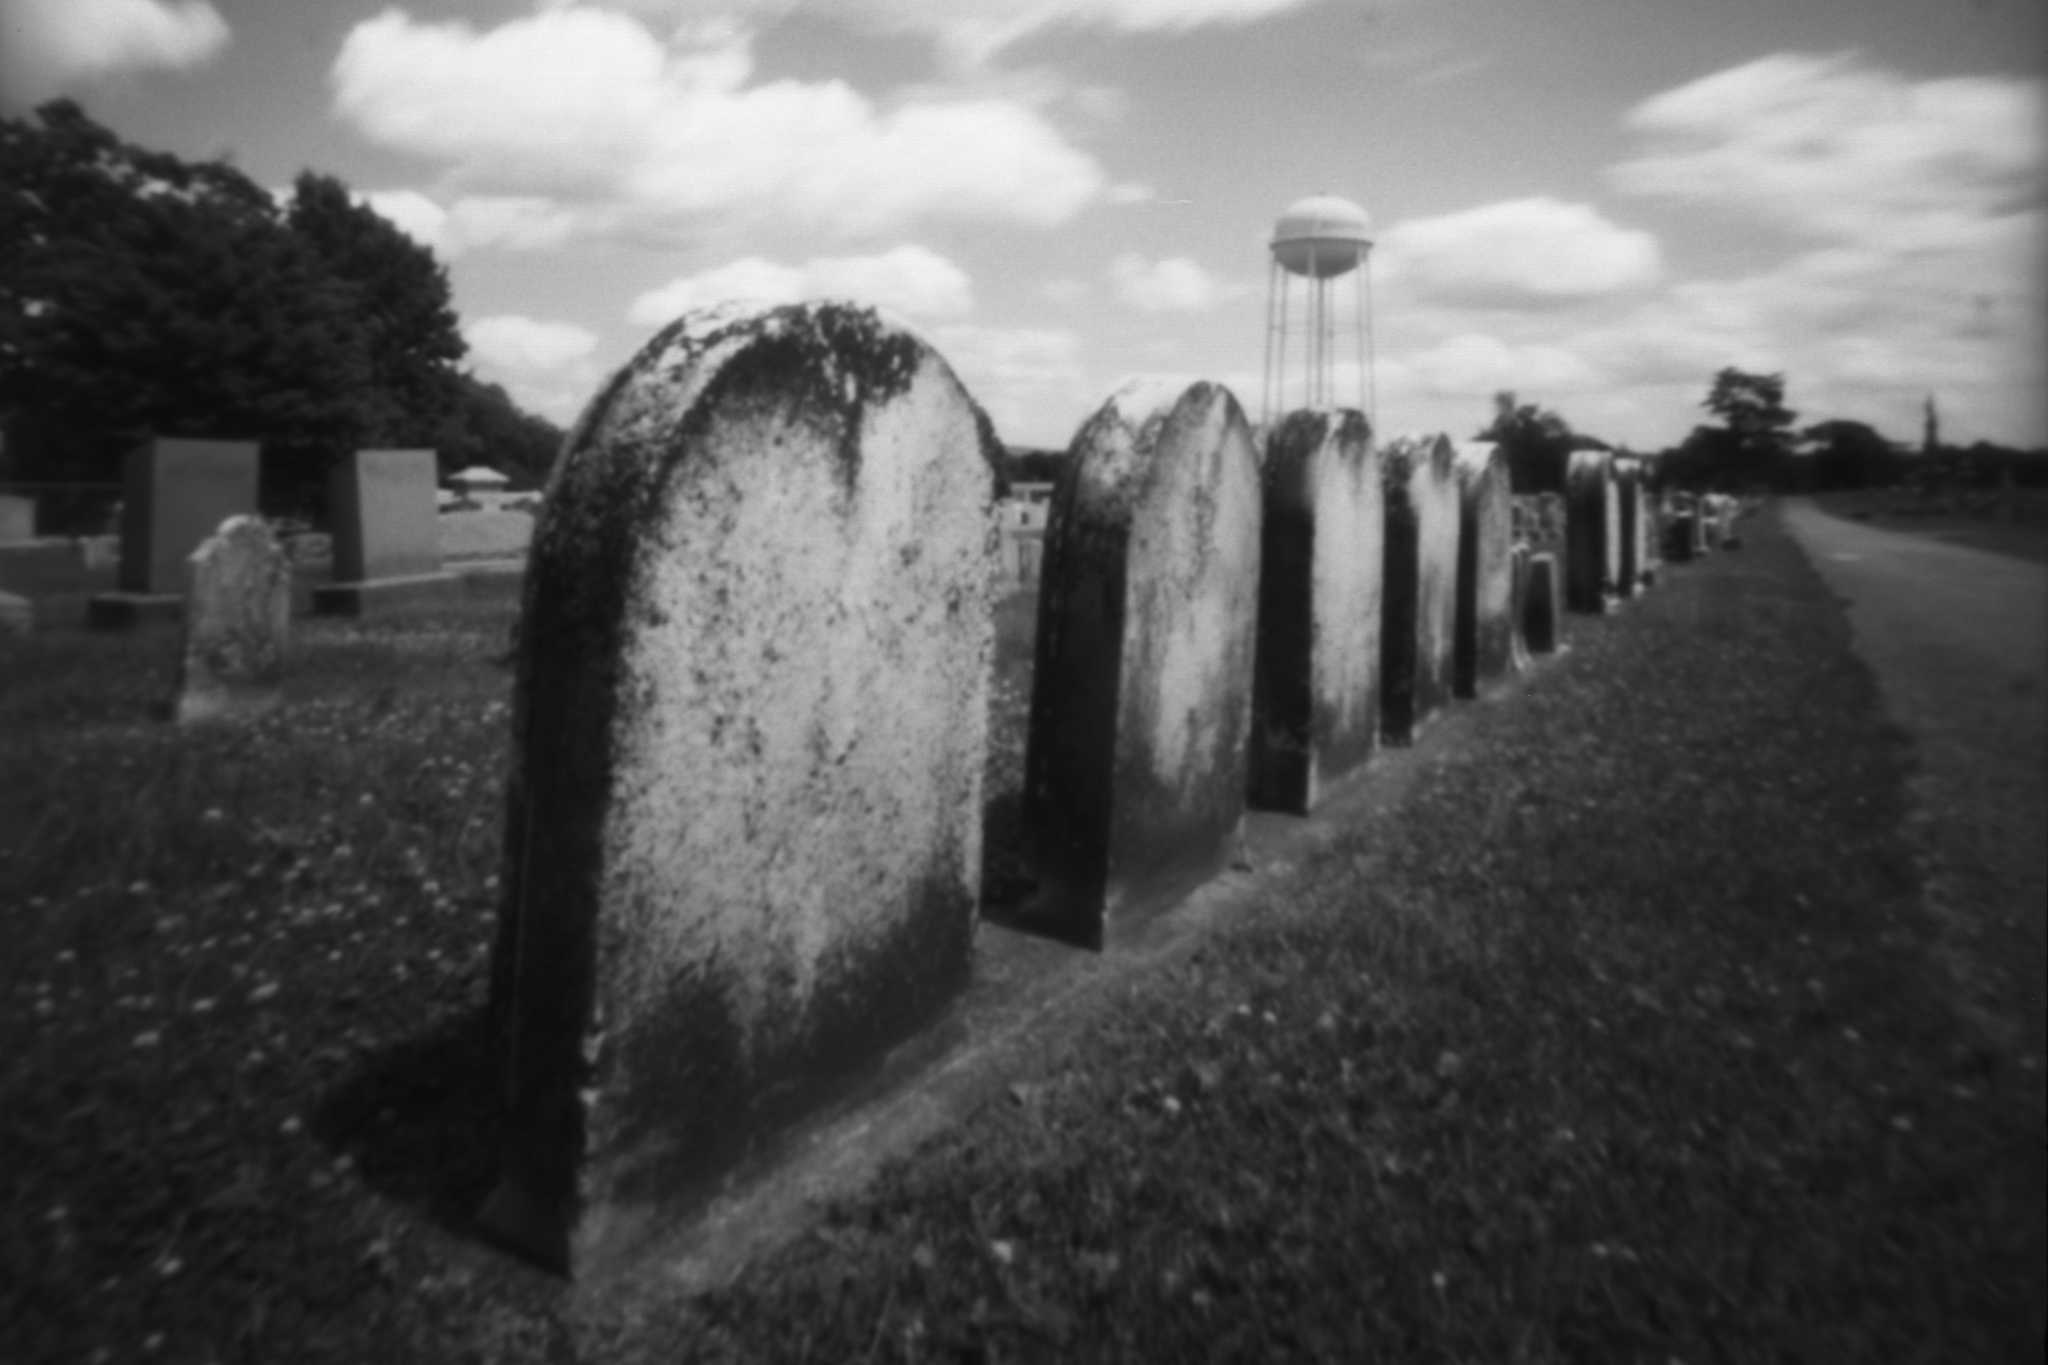 Fairview Cemetery. Kutztown, Pennsylvania. Zero Image 6x9.